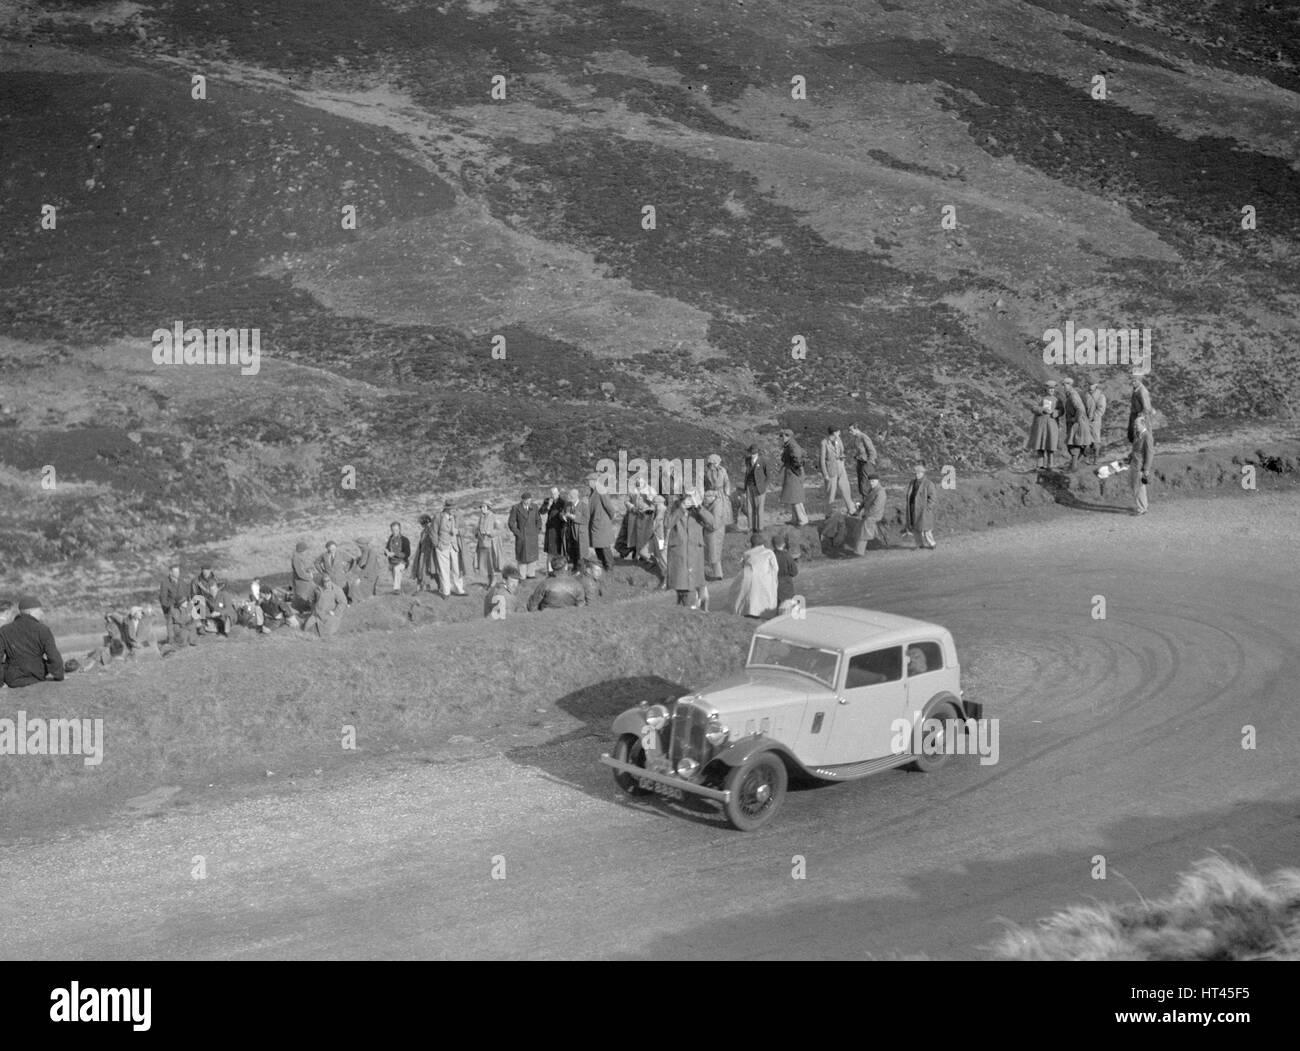 Austin 12/6 of JW Flewitt at the RSAC Scottish Rally, Devil's Elbow, Glenshee, 1934. Artist: Bill Brunell. - Stock Image